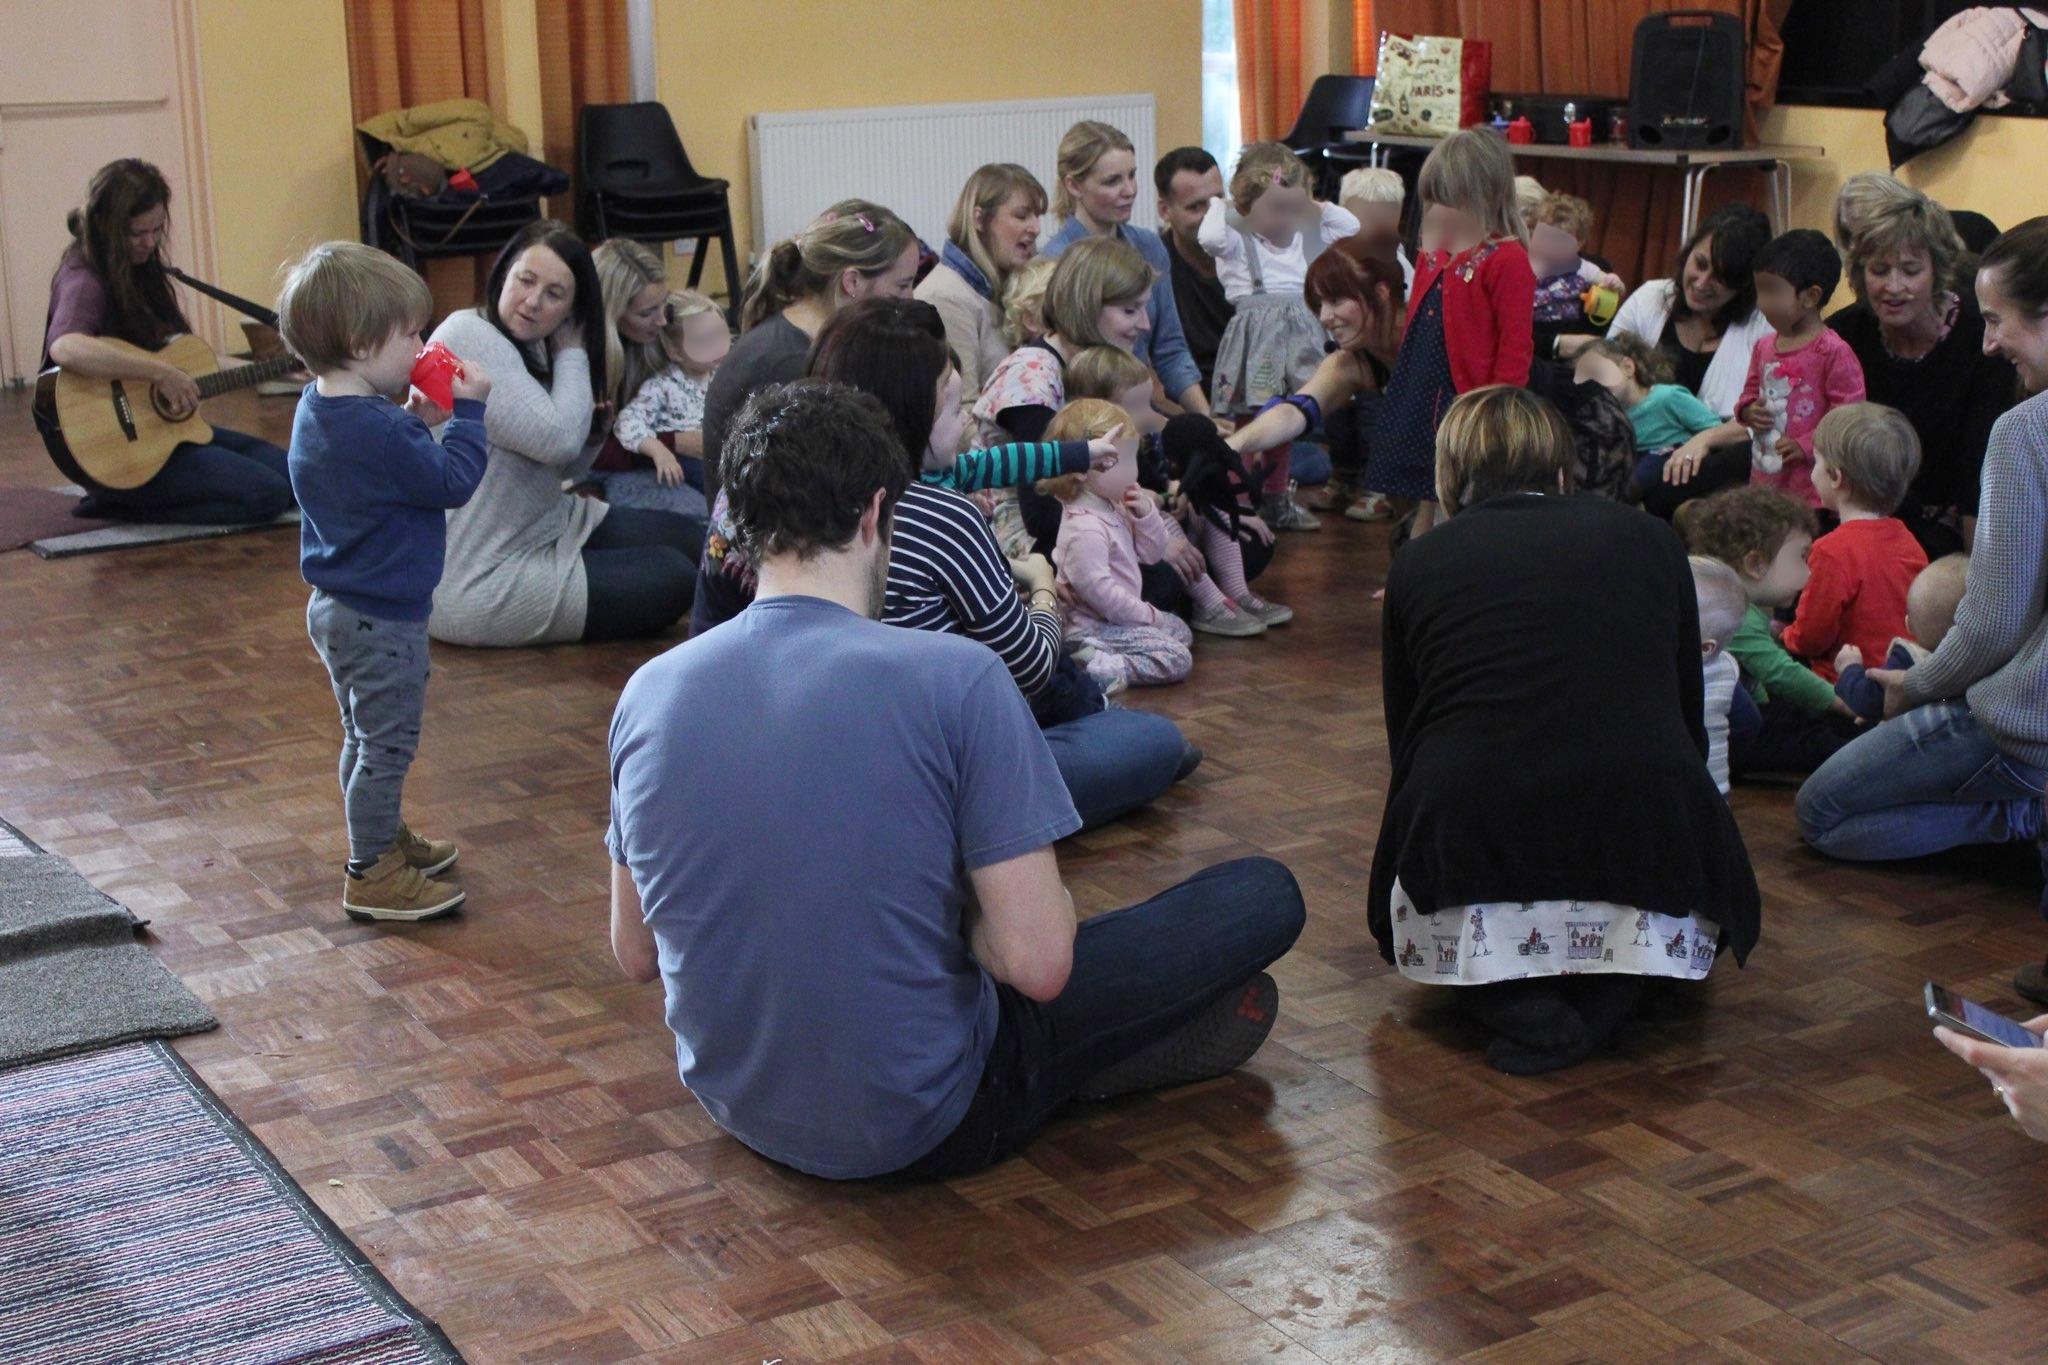 children-and-parents-listen-to-music-piccolo-music-gateshead-preschool-classes-baby-toddler-gateshead-newcastle-heaton-north-tyneside